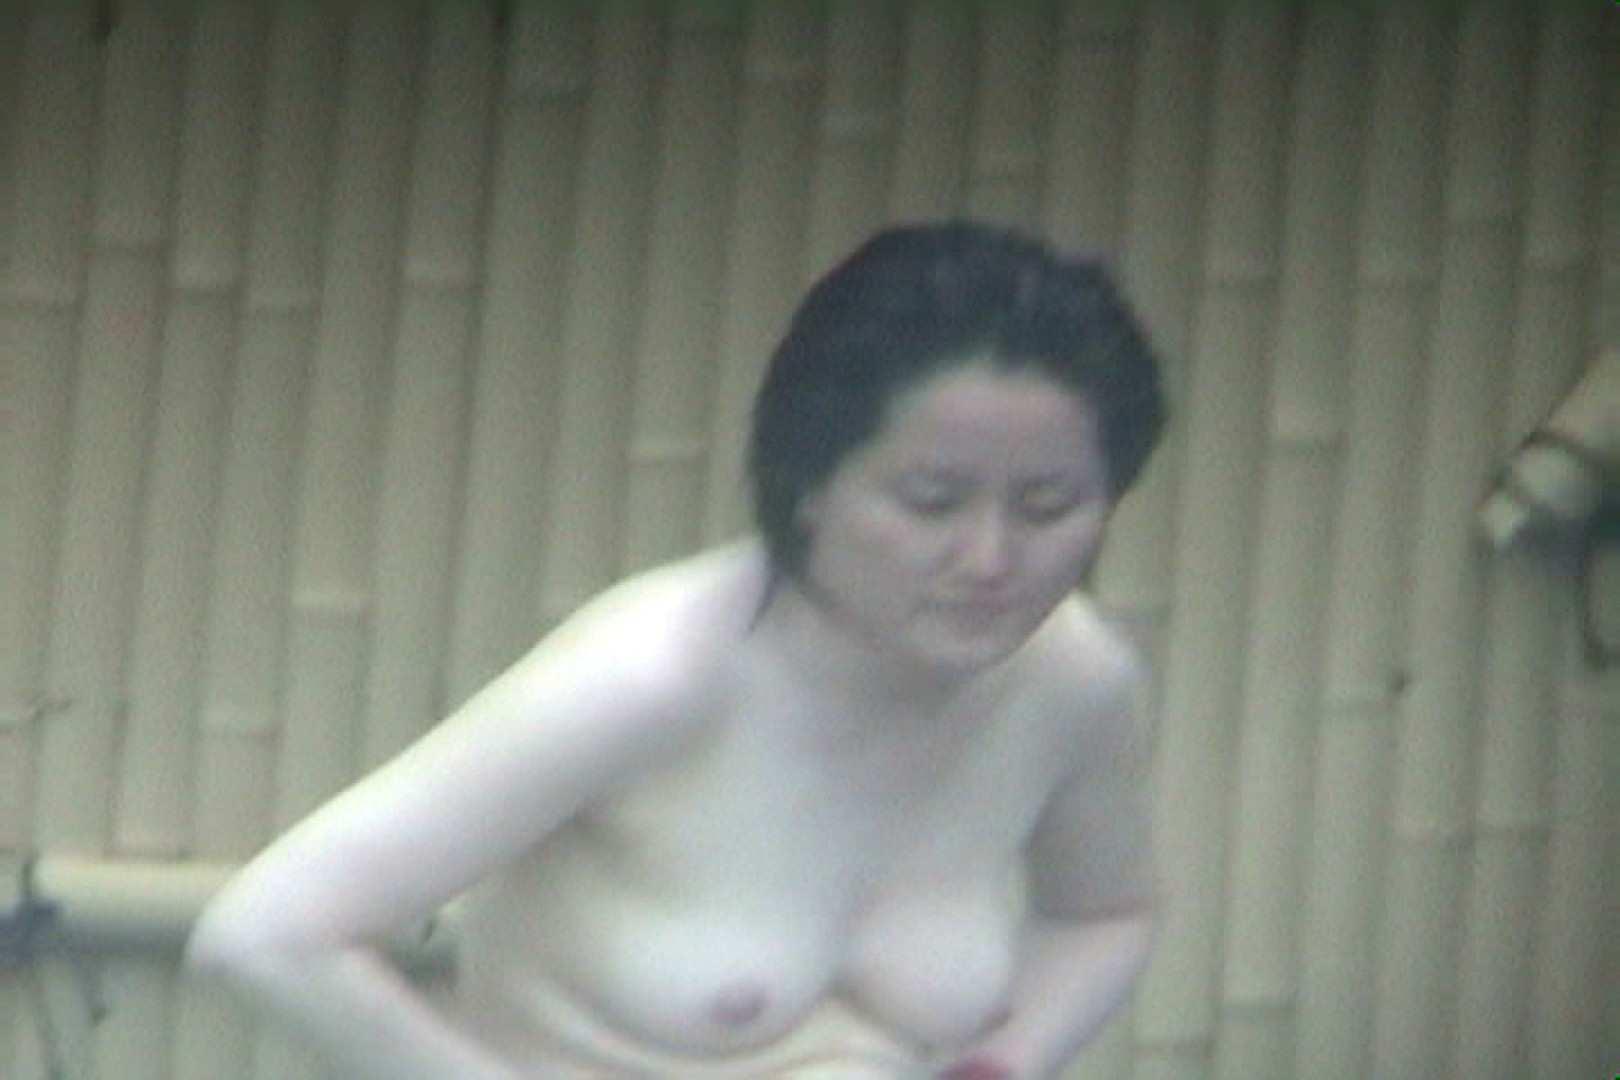 Aquaな露天風呂Vol.107 露天風呂編  111PIX 66